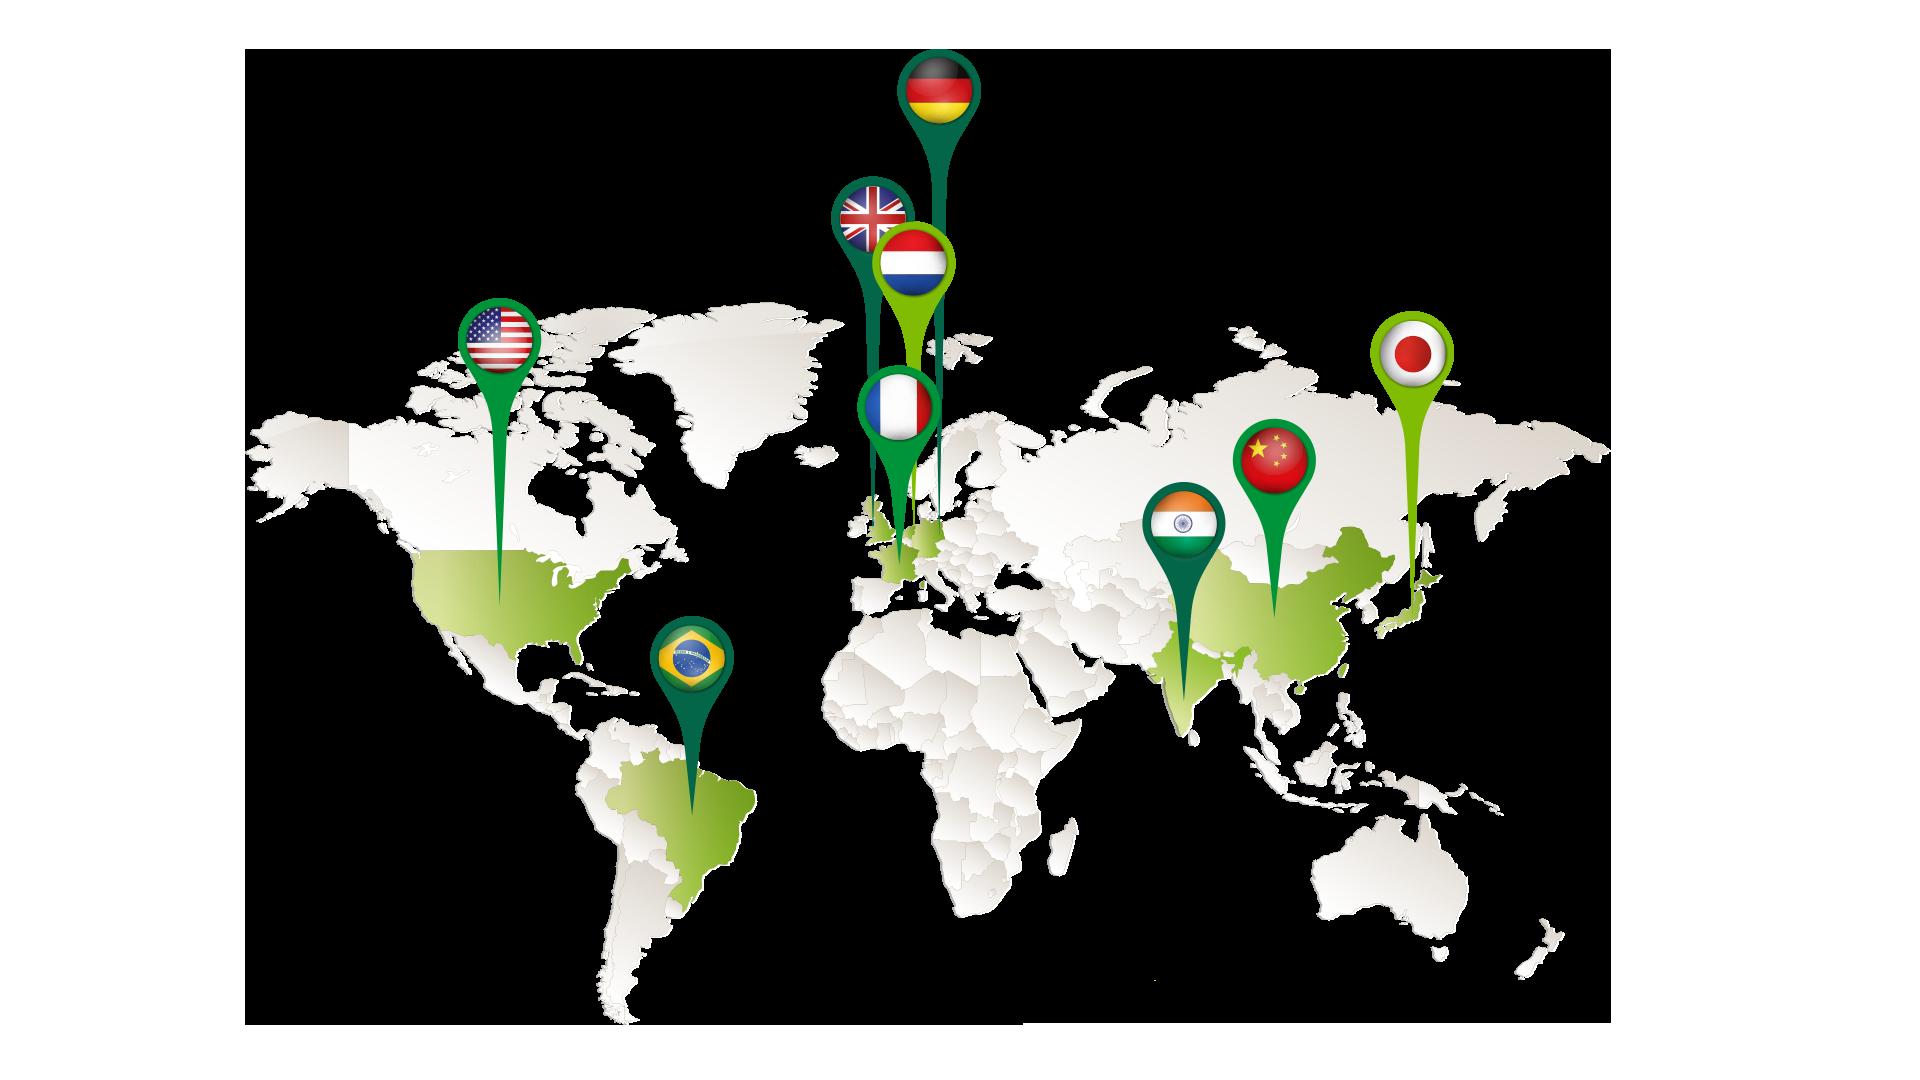 Países onde a GLP está presente